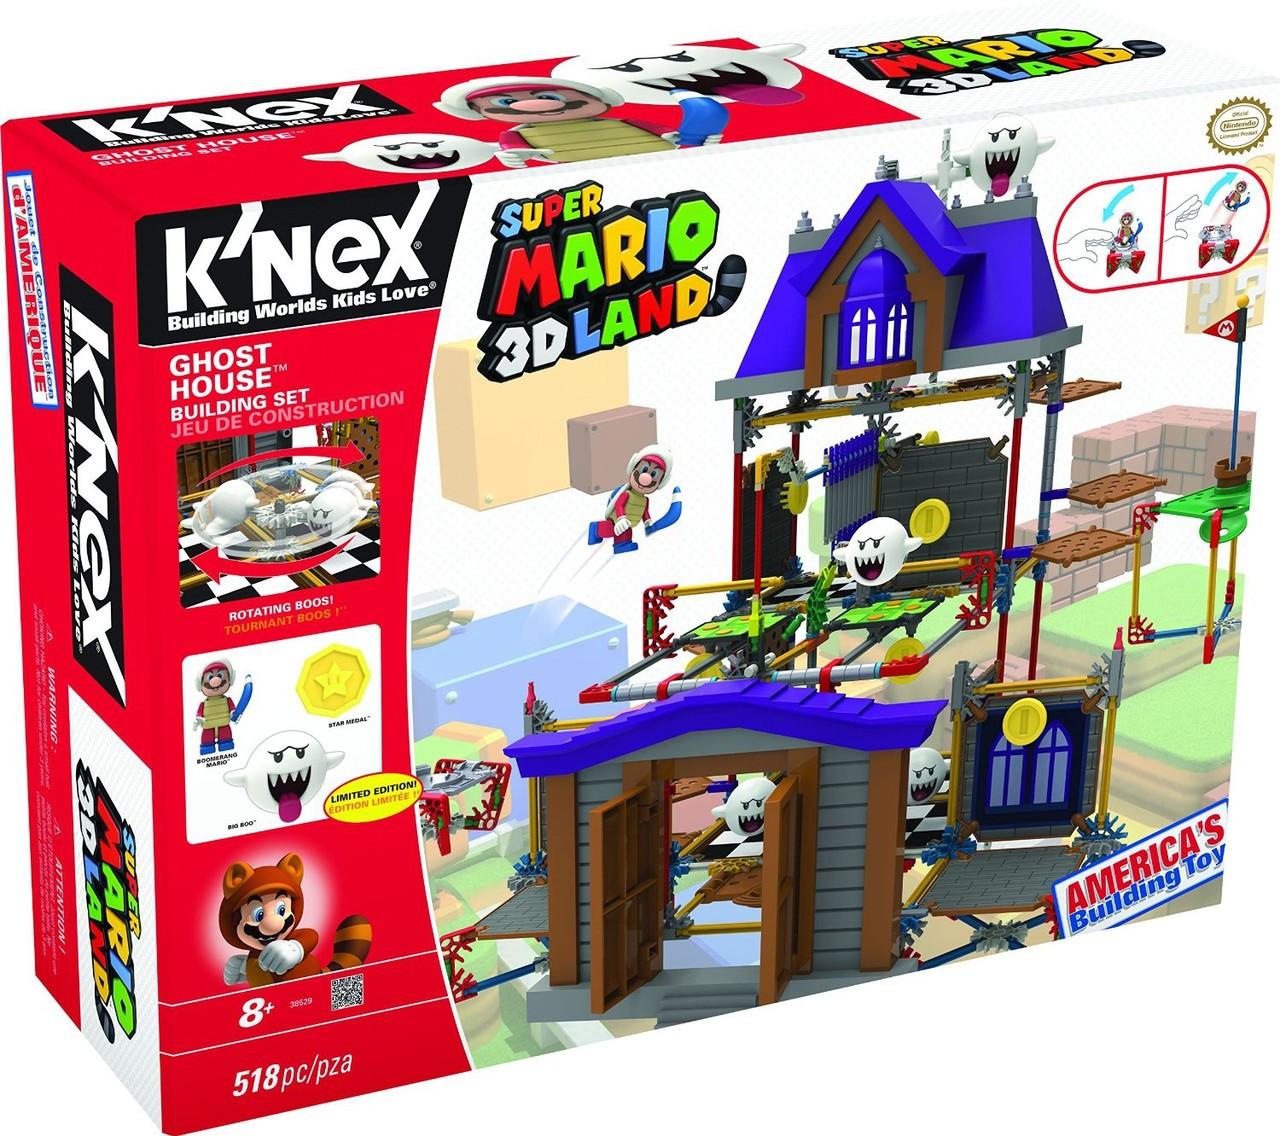 KNEX Super Mario 3D Land Ghost House Set 38529 - ToyWiz